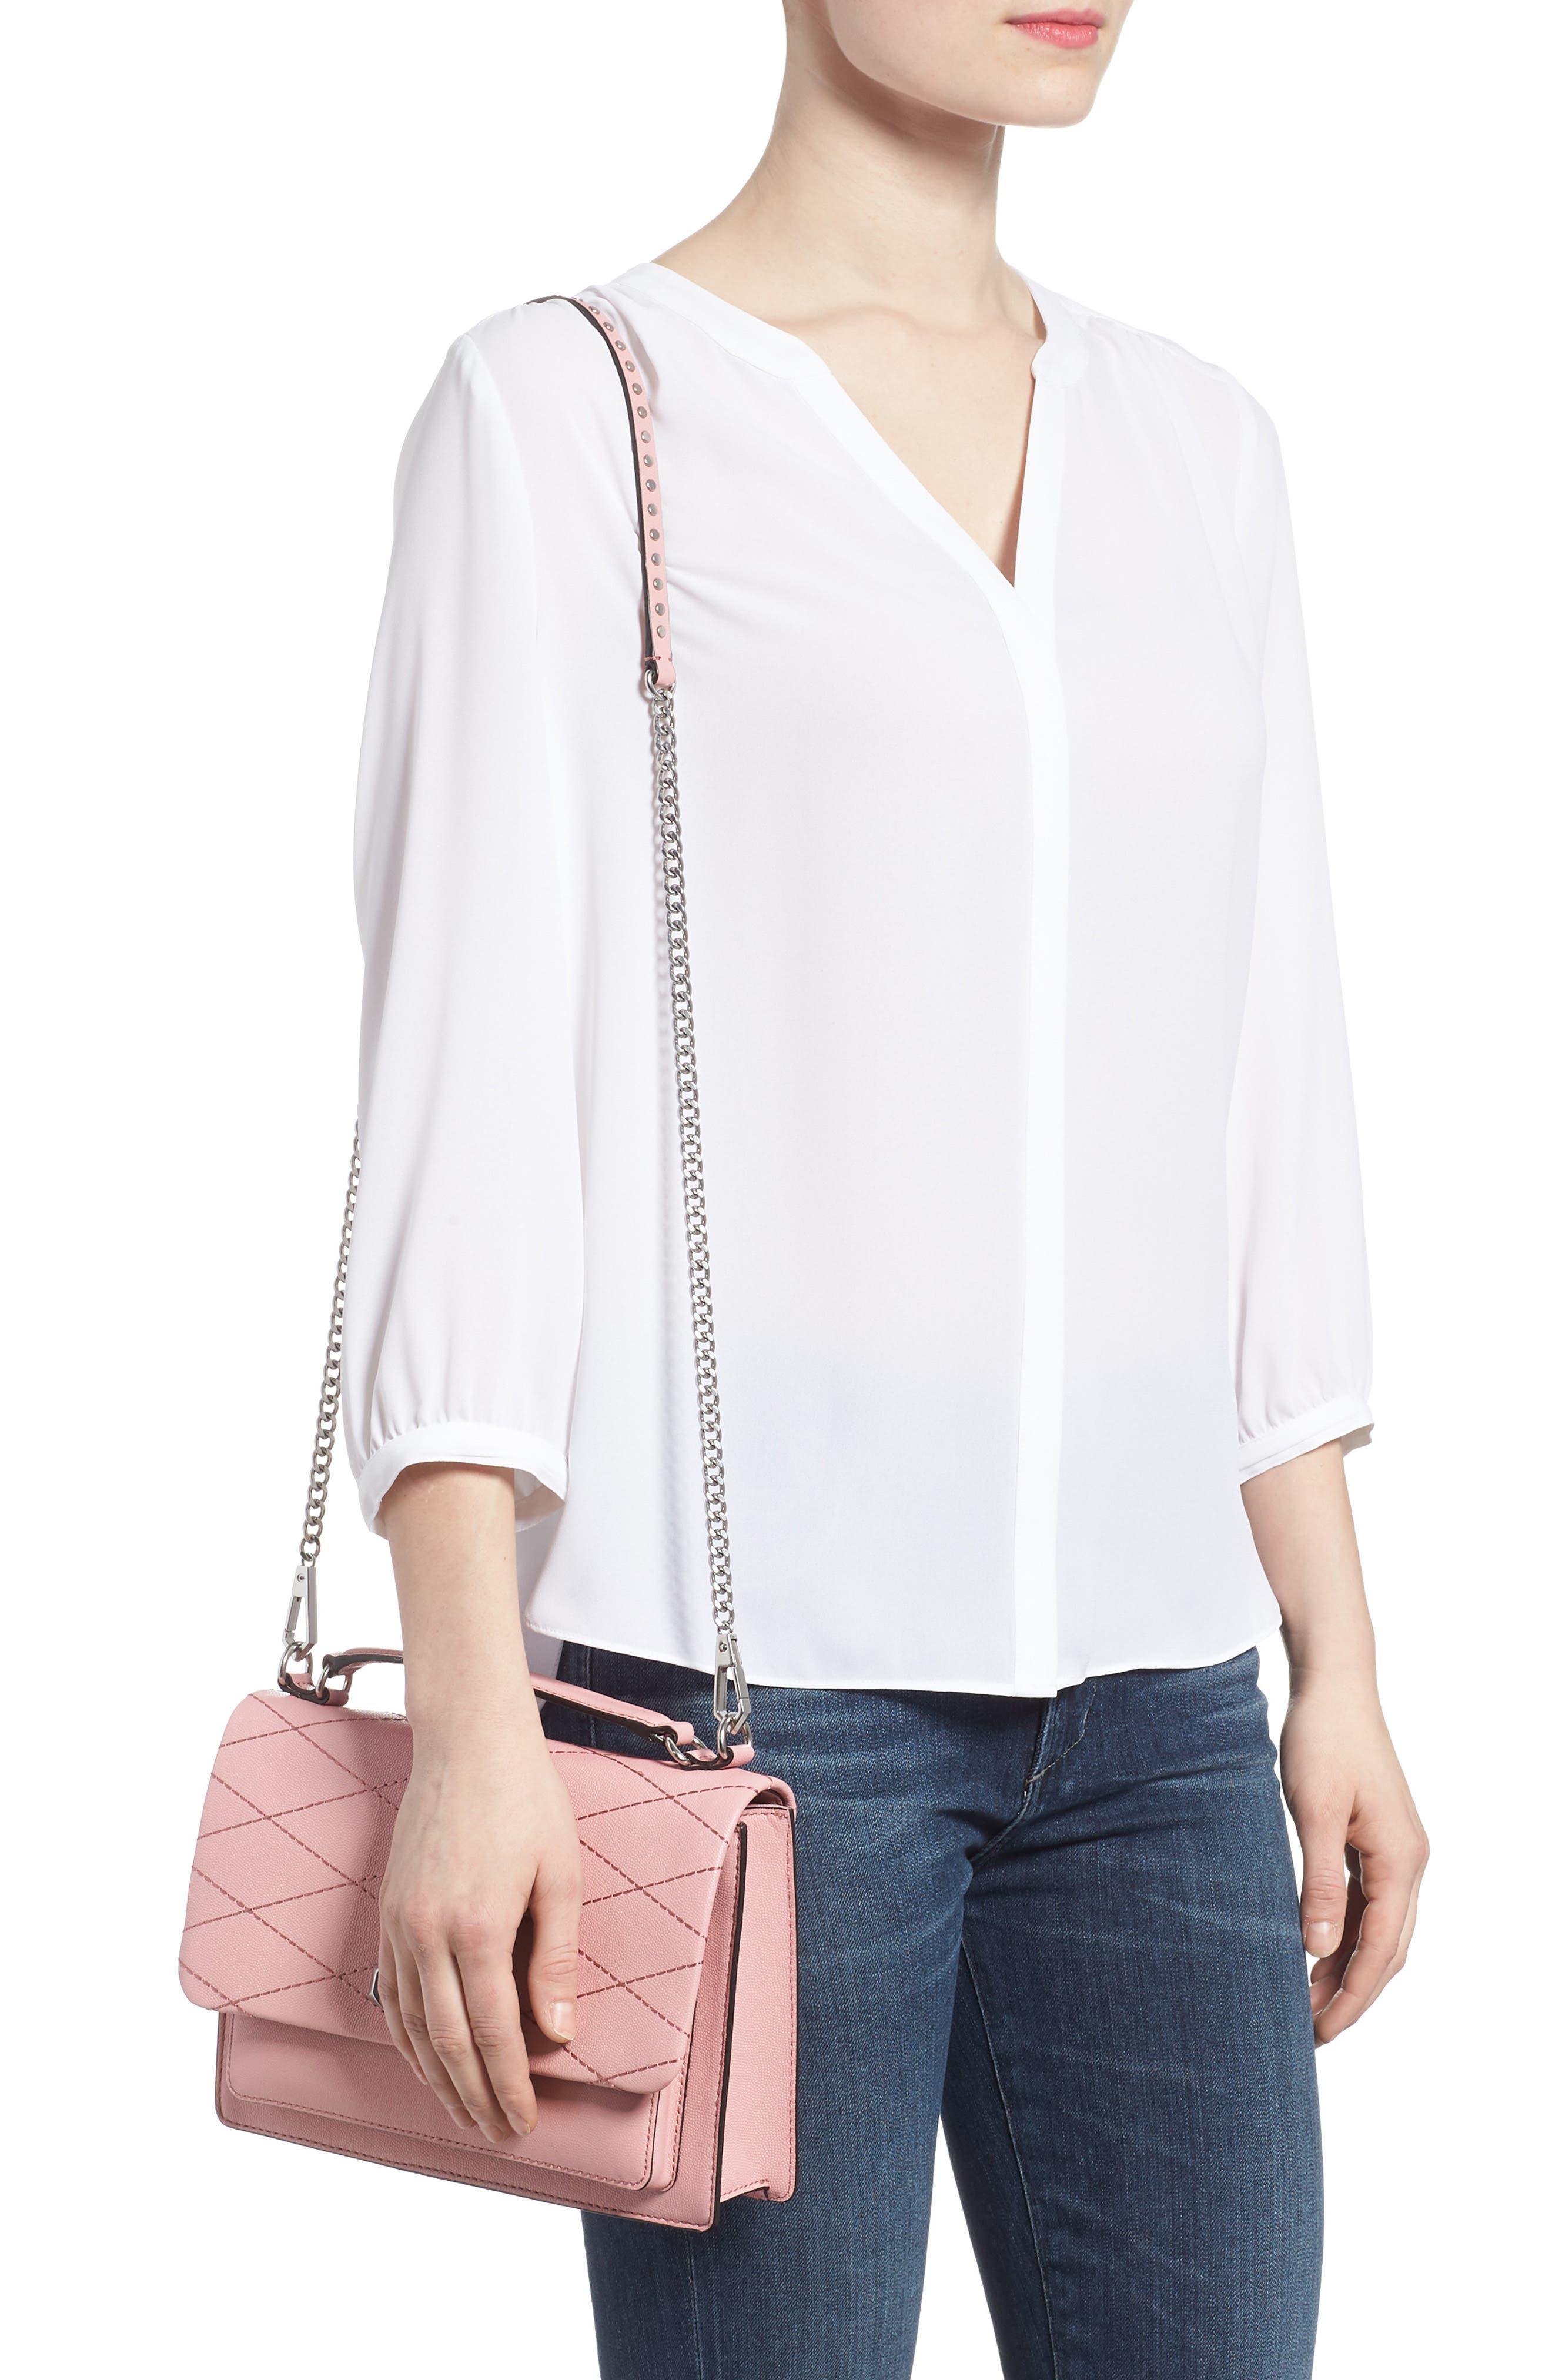 Medium Je T'aime Convertible Leather Crossbody Bag,                             Alternate thumbnail 19, color,